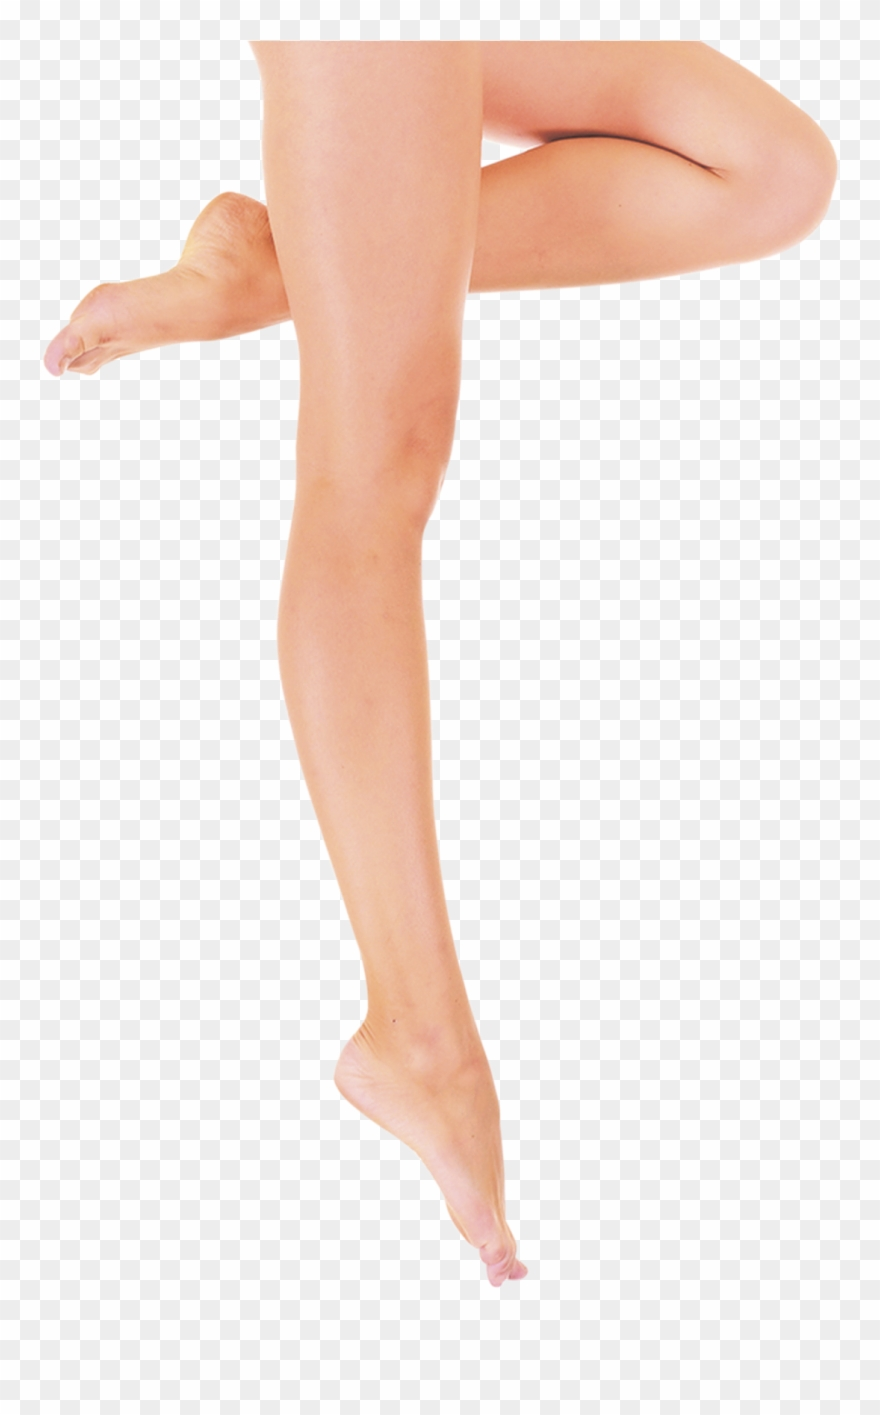 Female Leg Clipart Png.